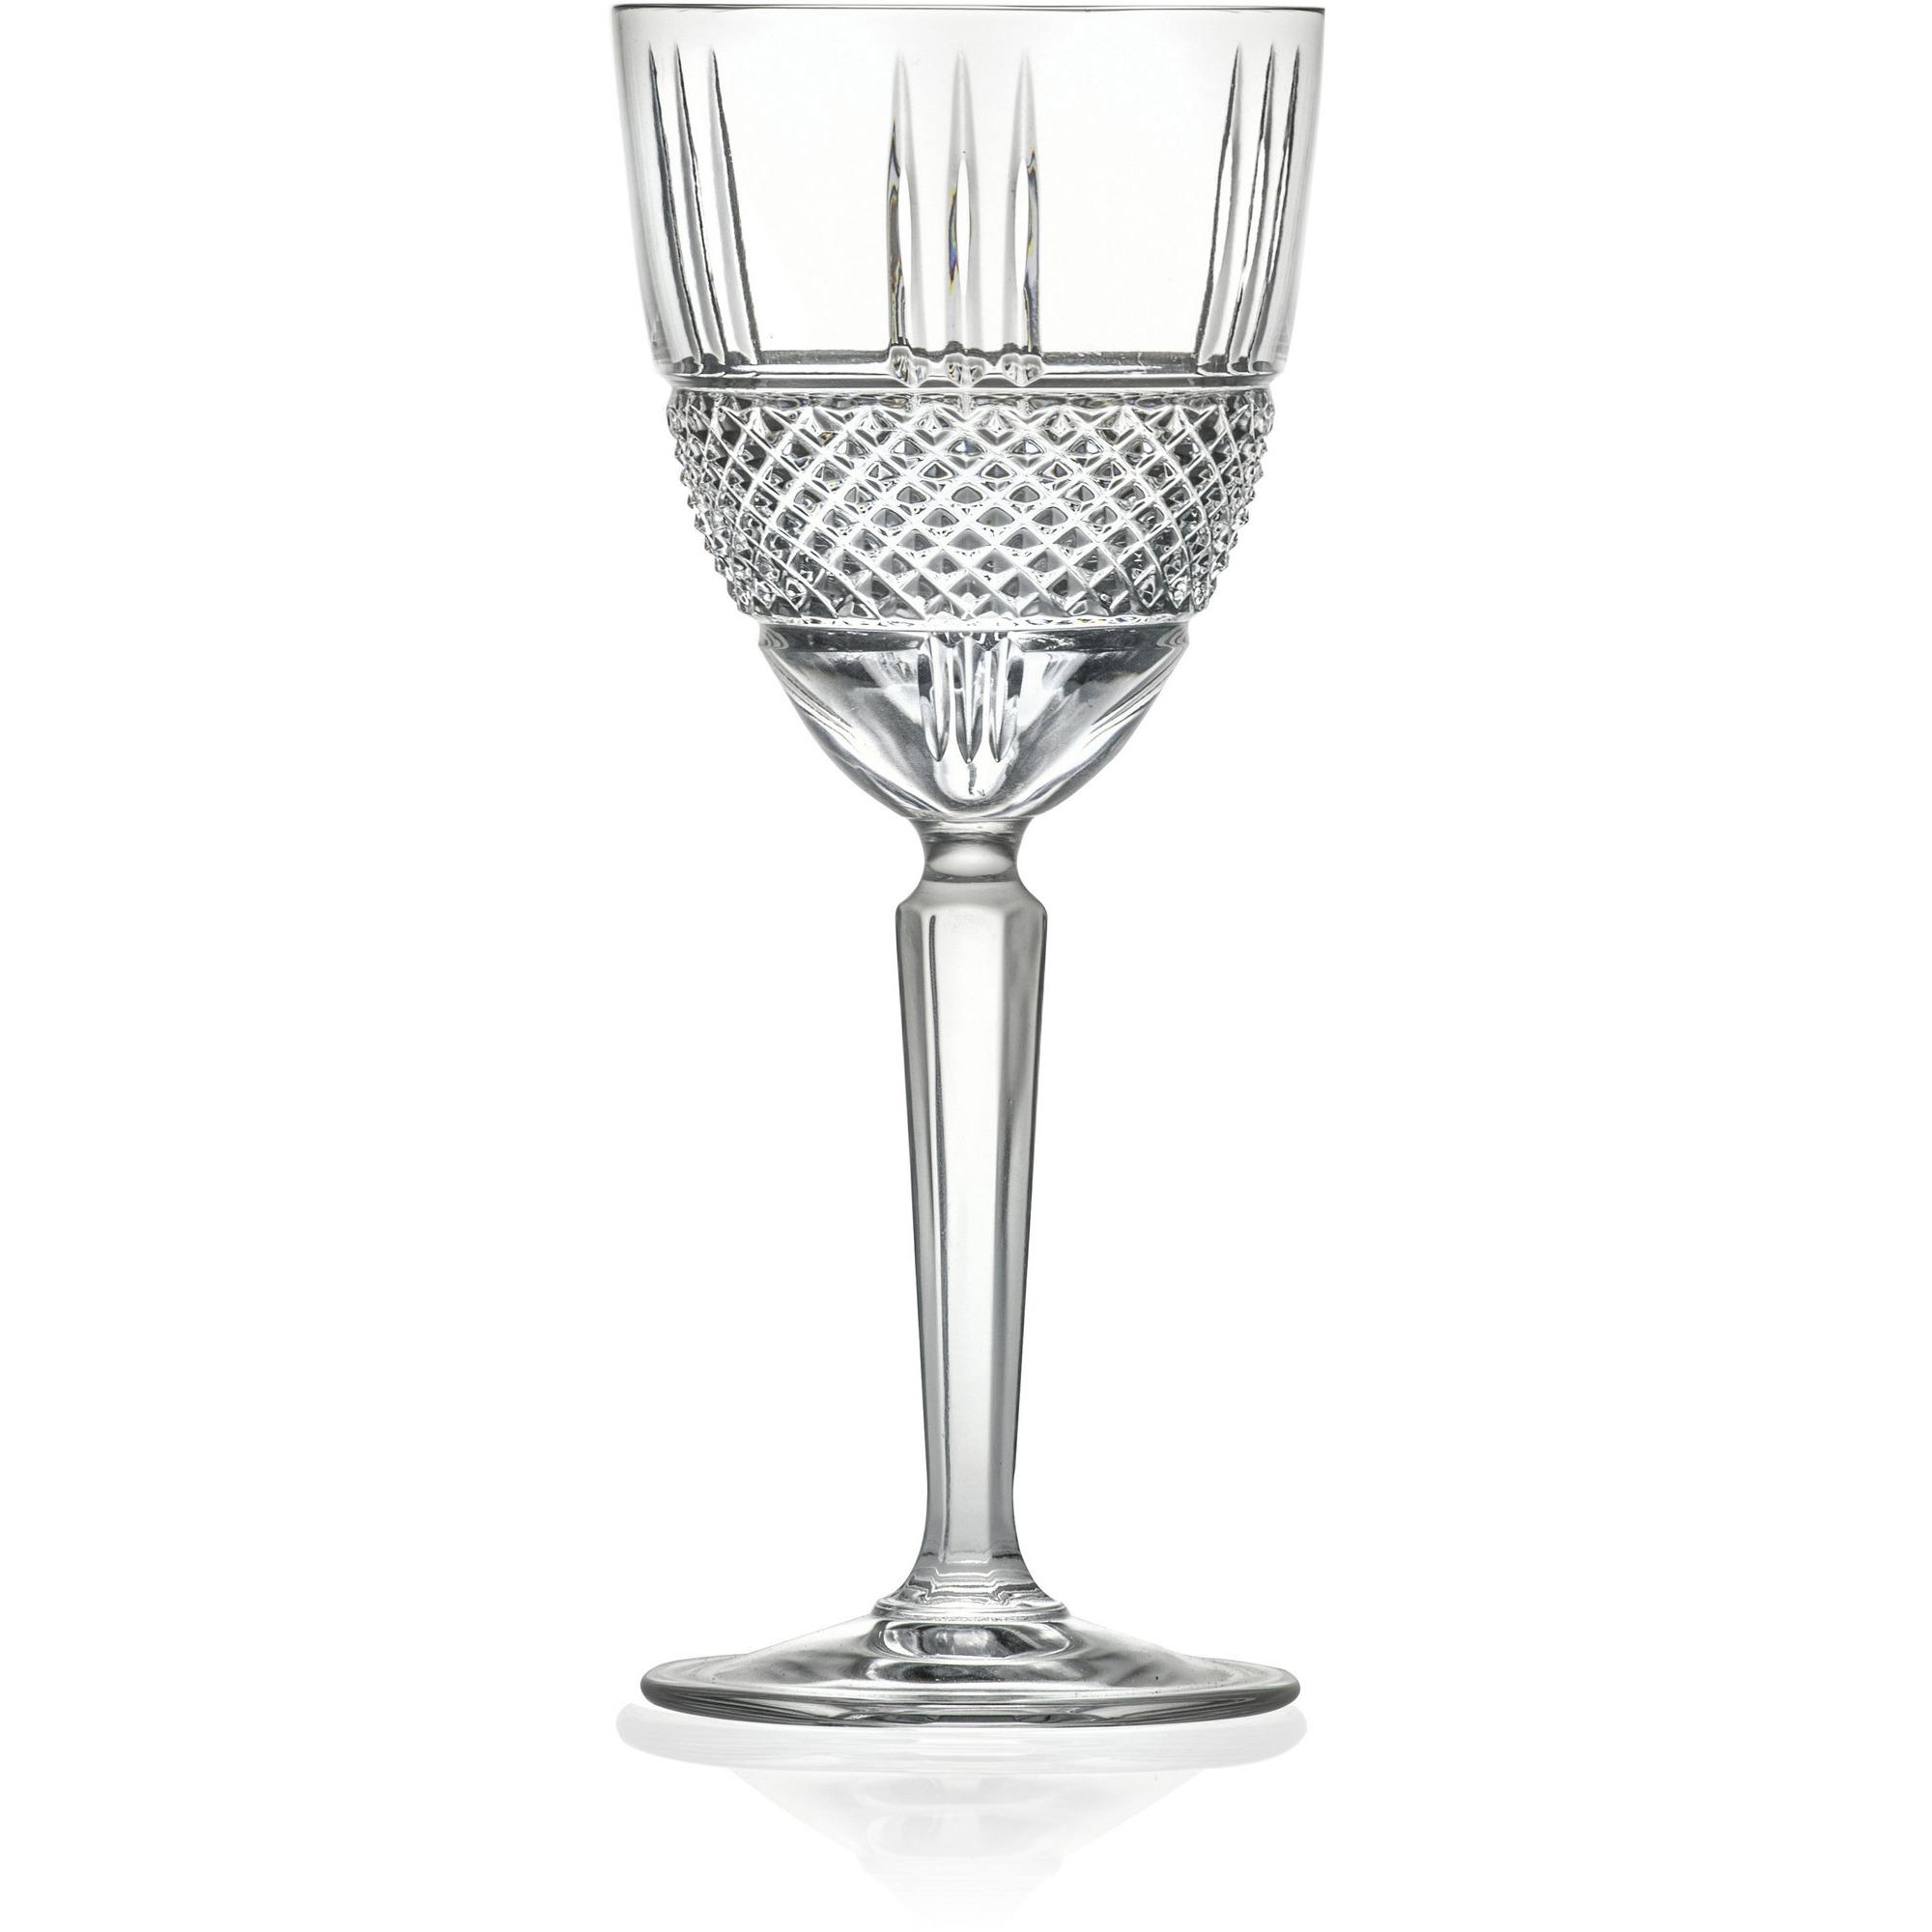 Lyngby Glas Brilliante Rödvinsglas 4 st